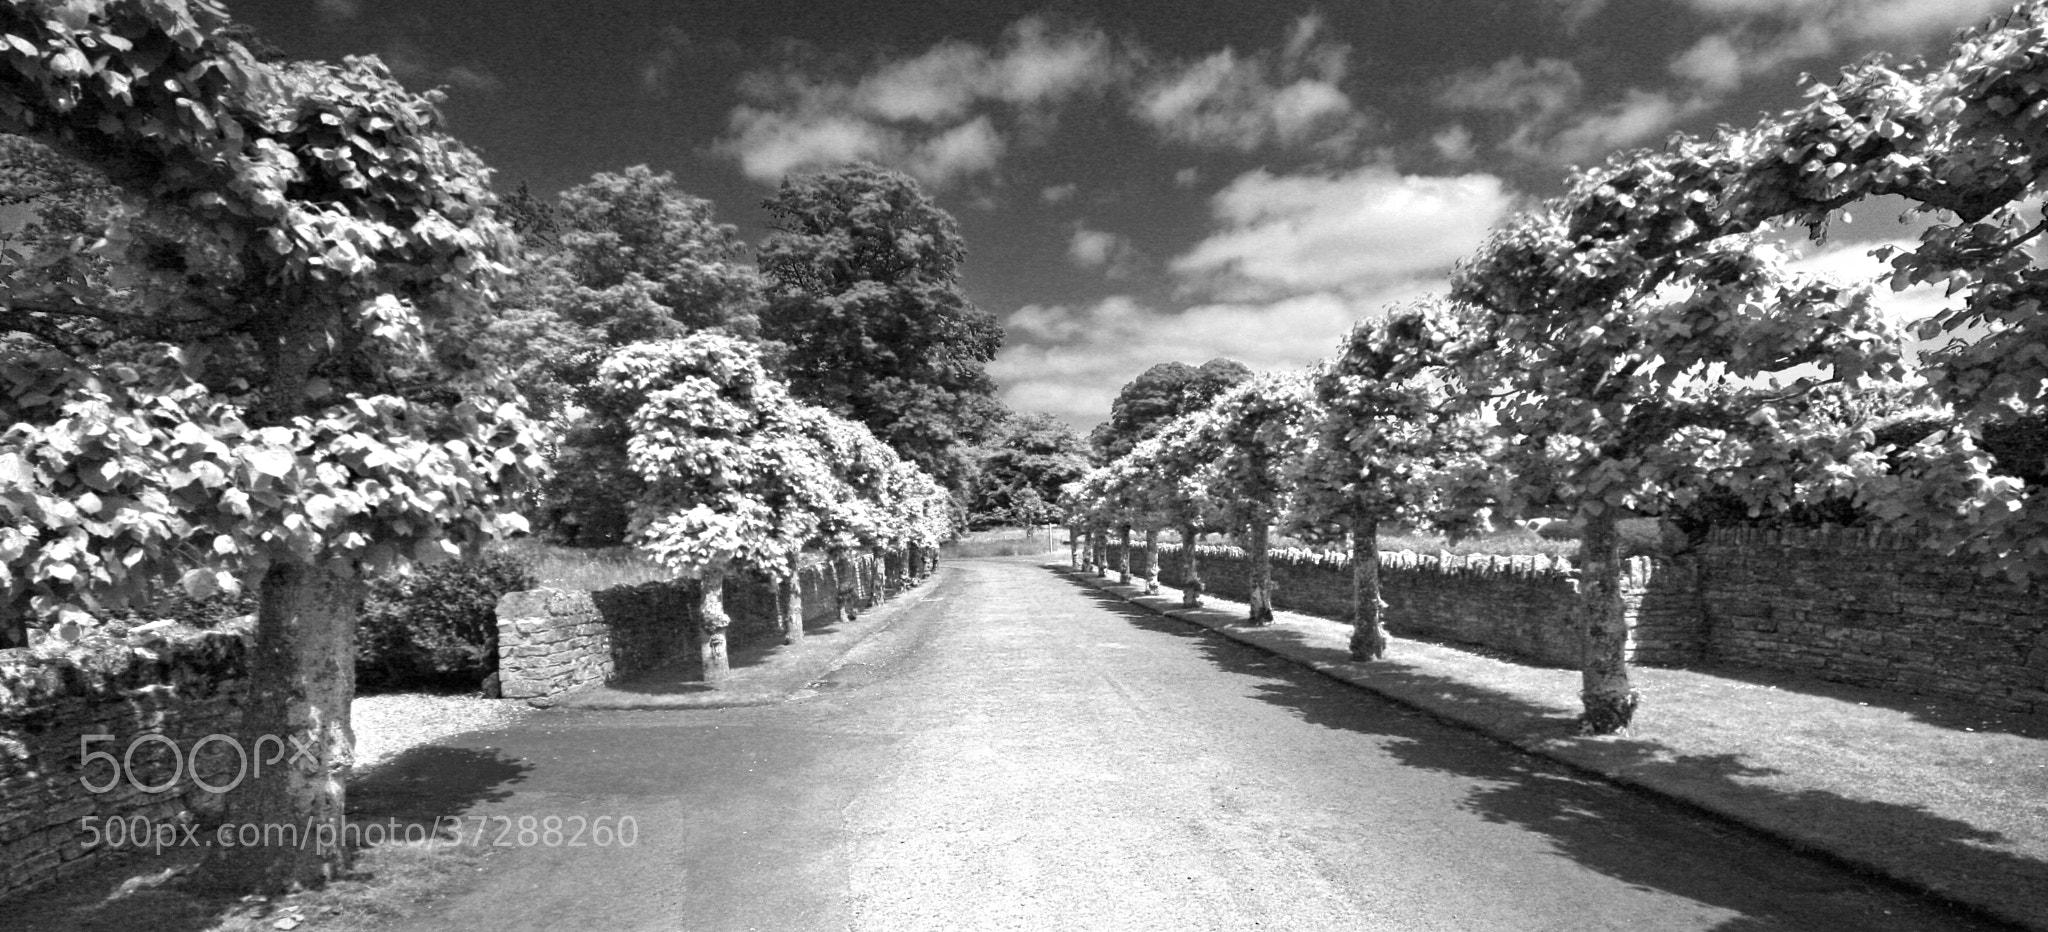 Photograph The Avenue by Wayil Rahmatalla on 500px